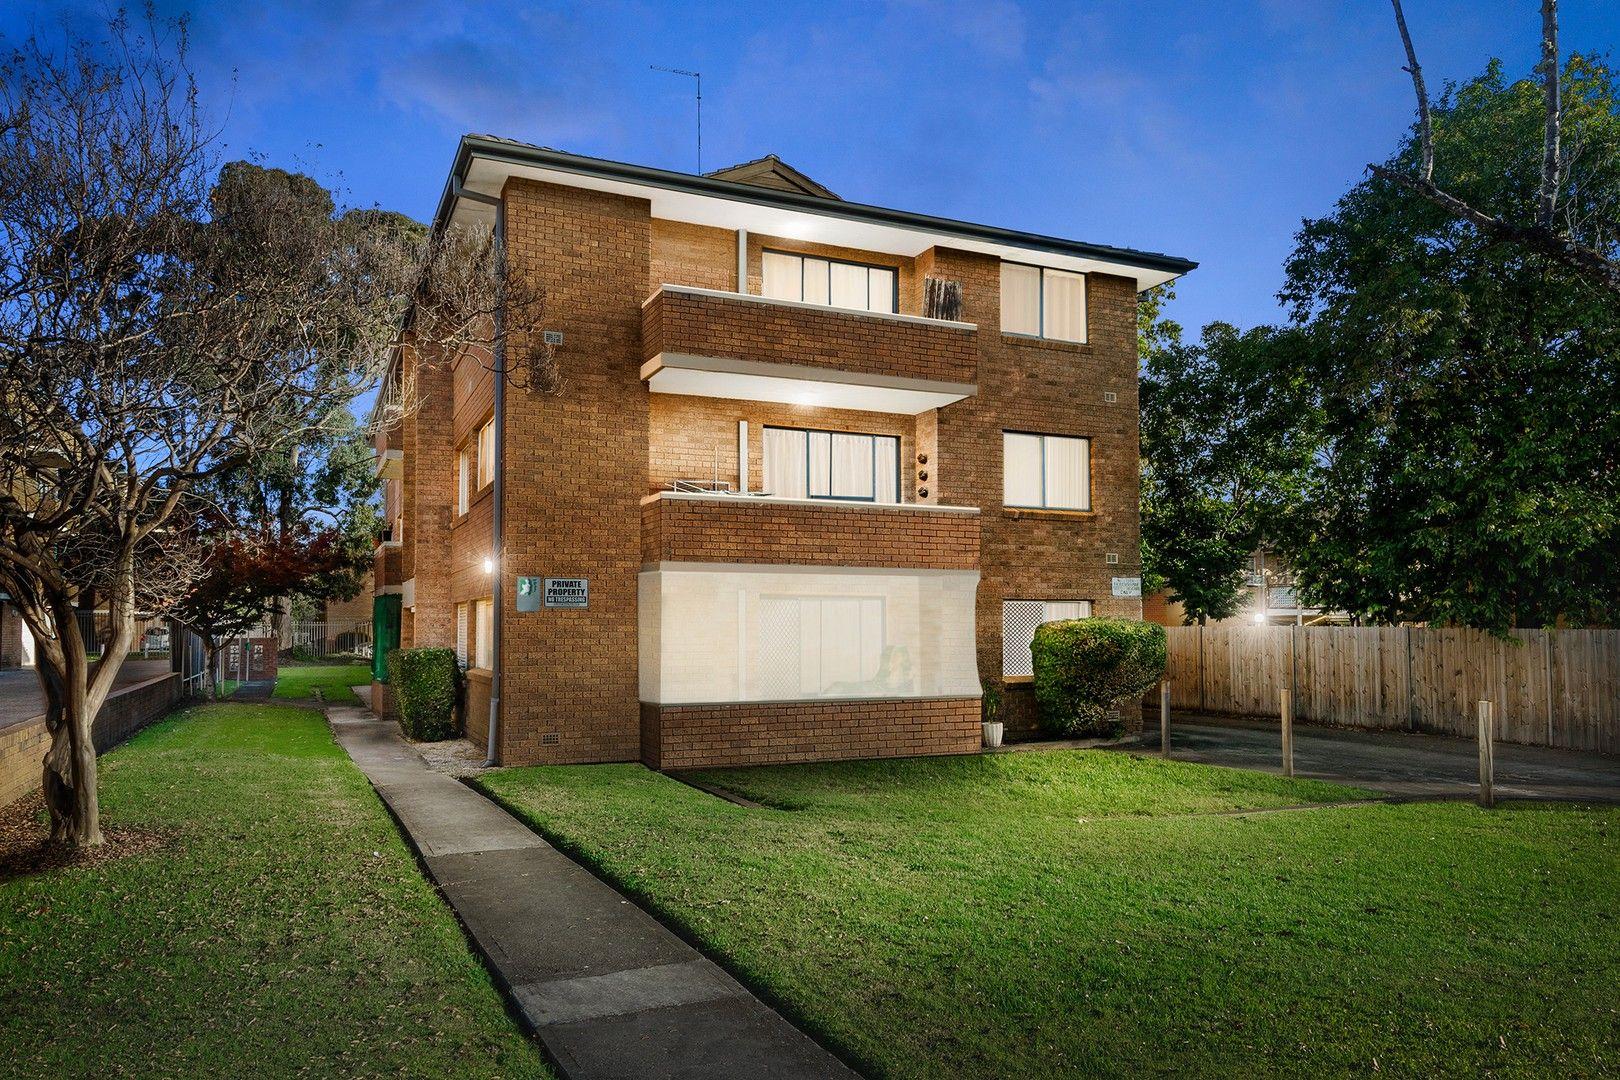 5/22 Putland Street, St Marys NSW 2760, Image 0